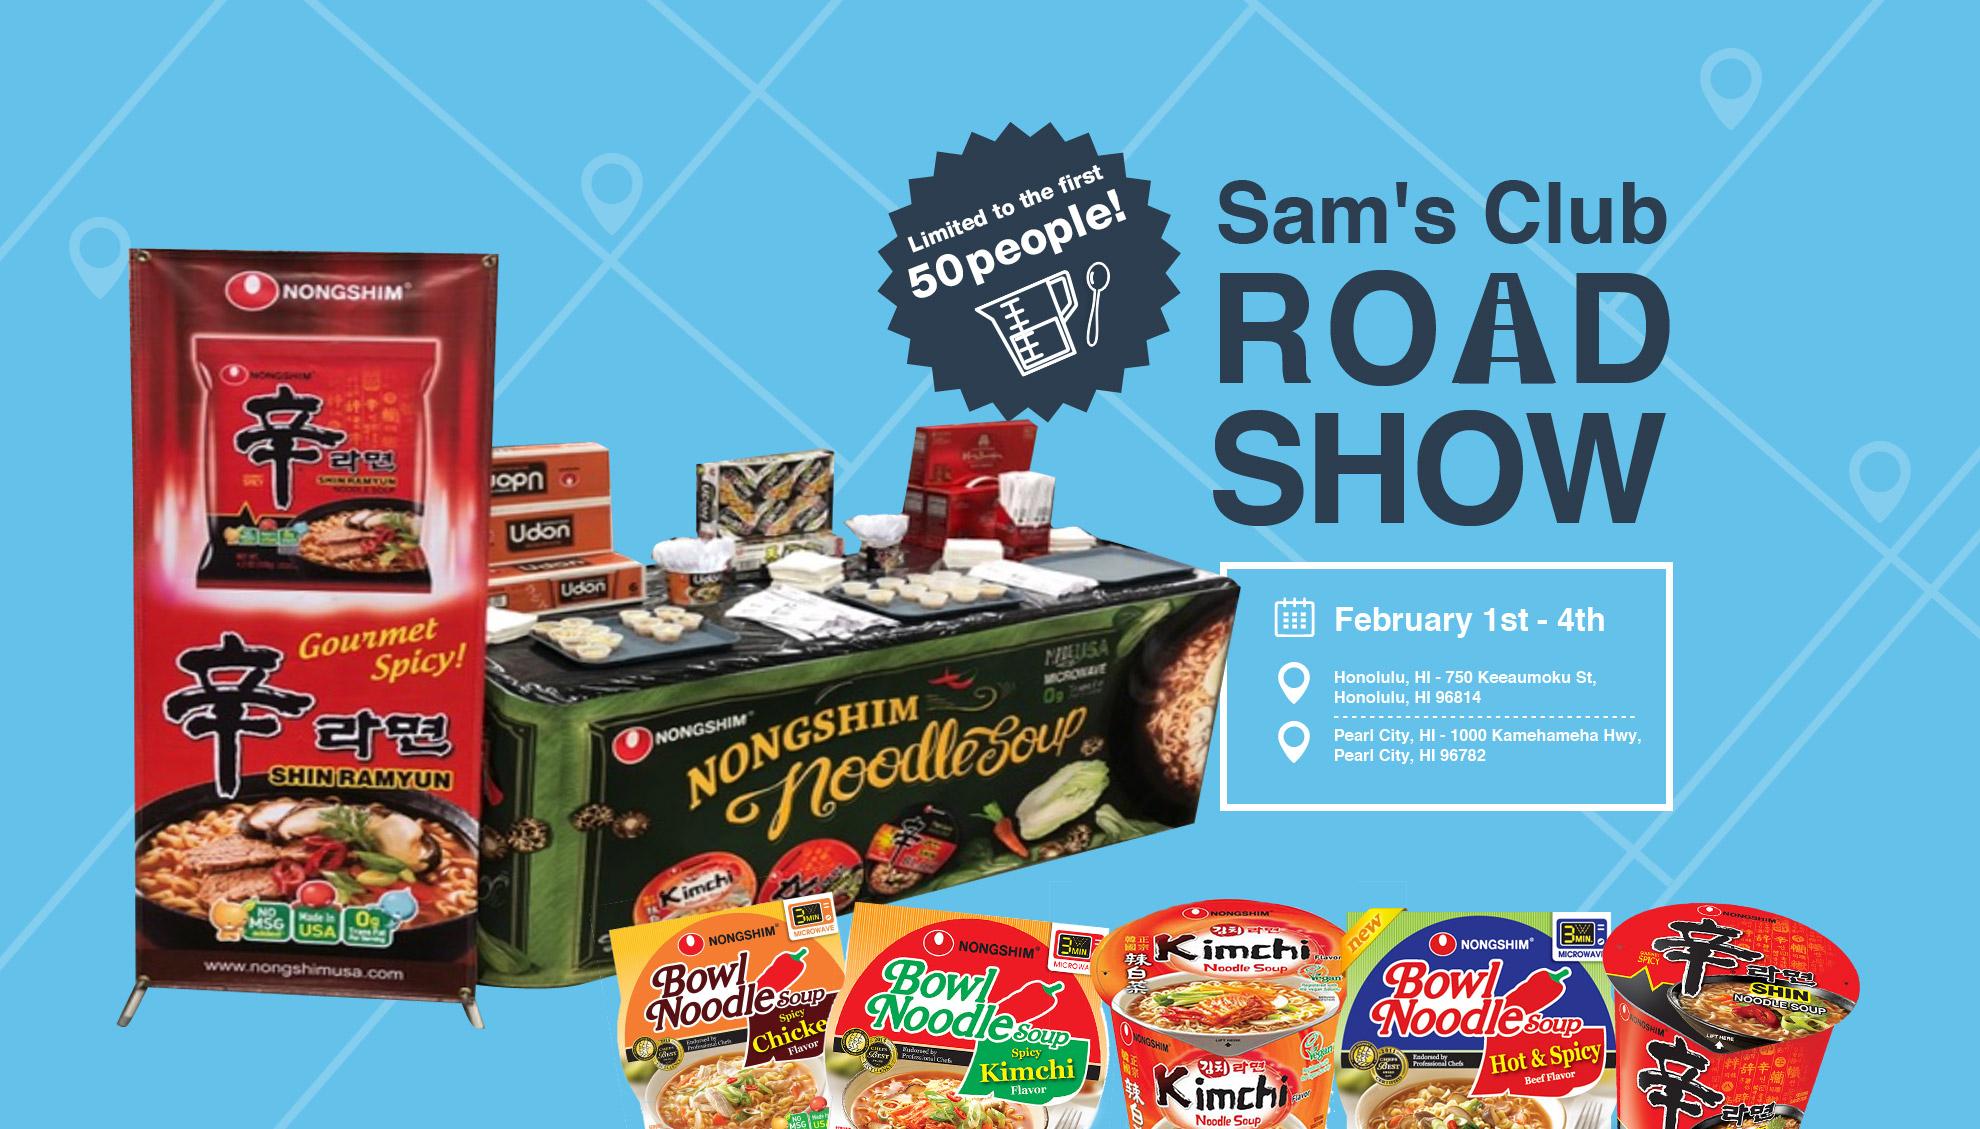 Sam's Club Road Show